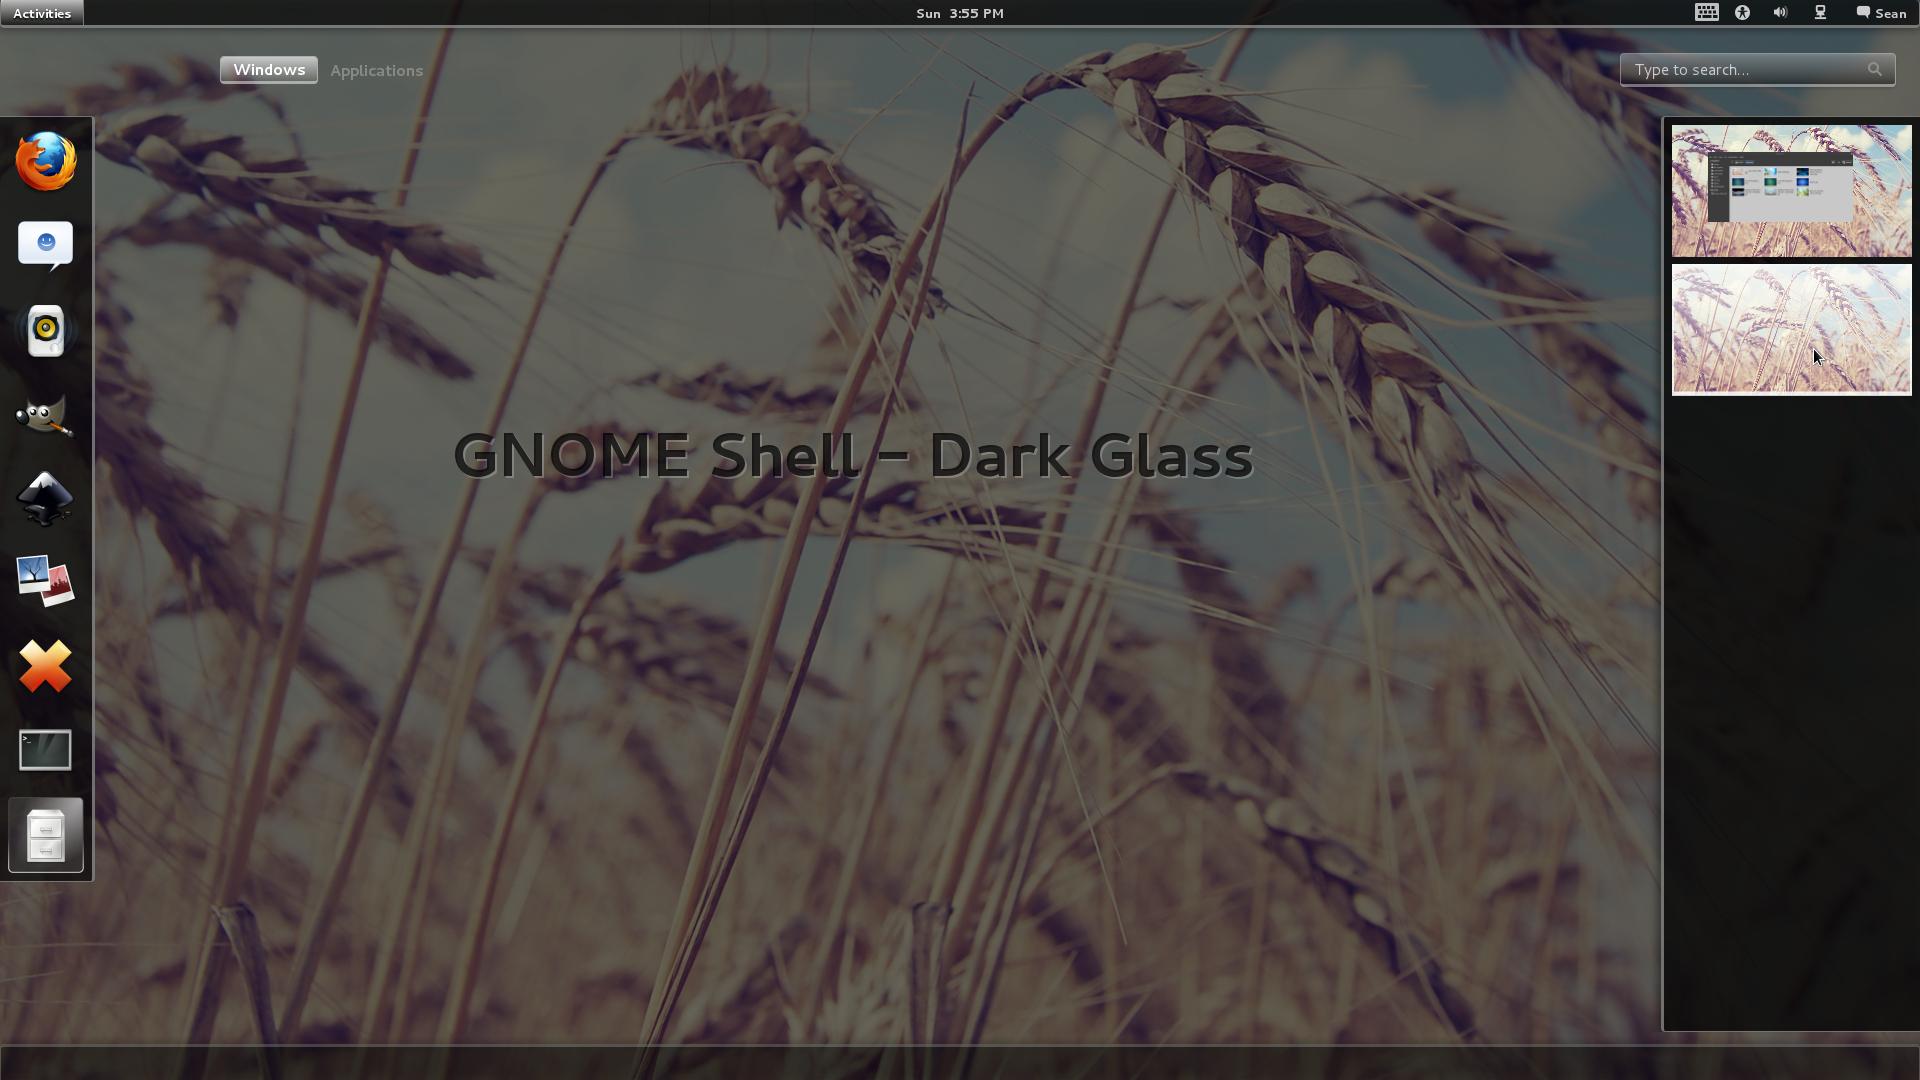 GNOME Shell - Dark Glass